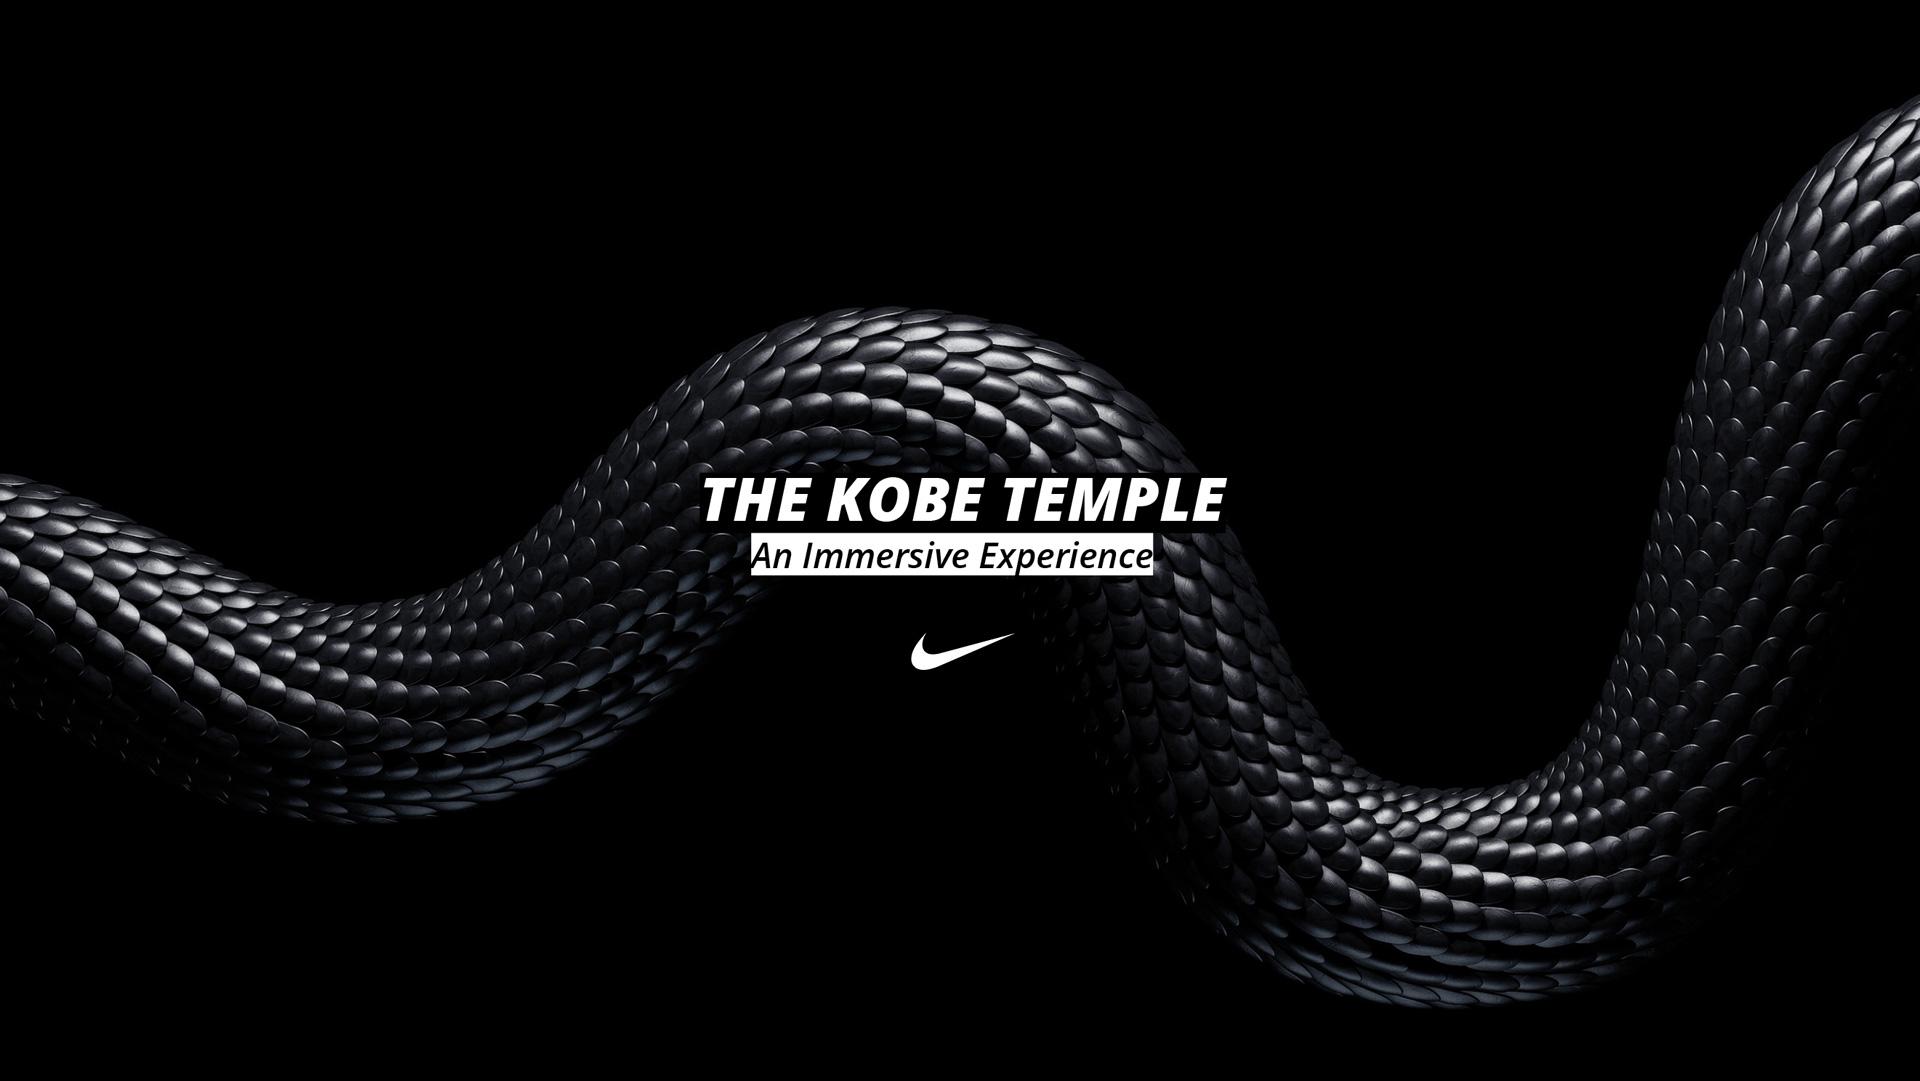 Kobe Temple